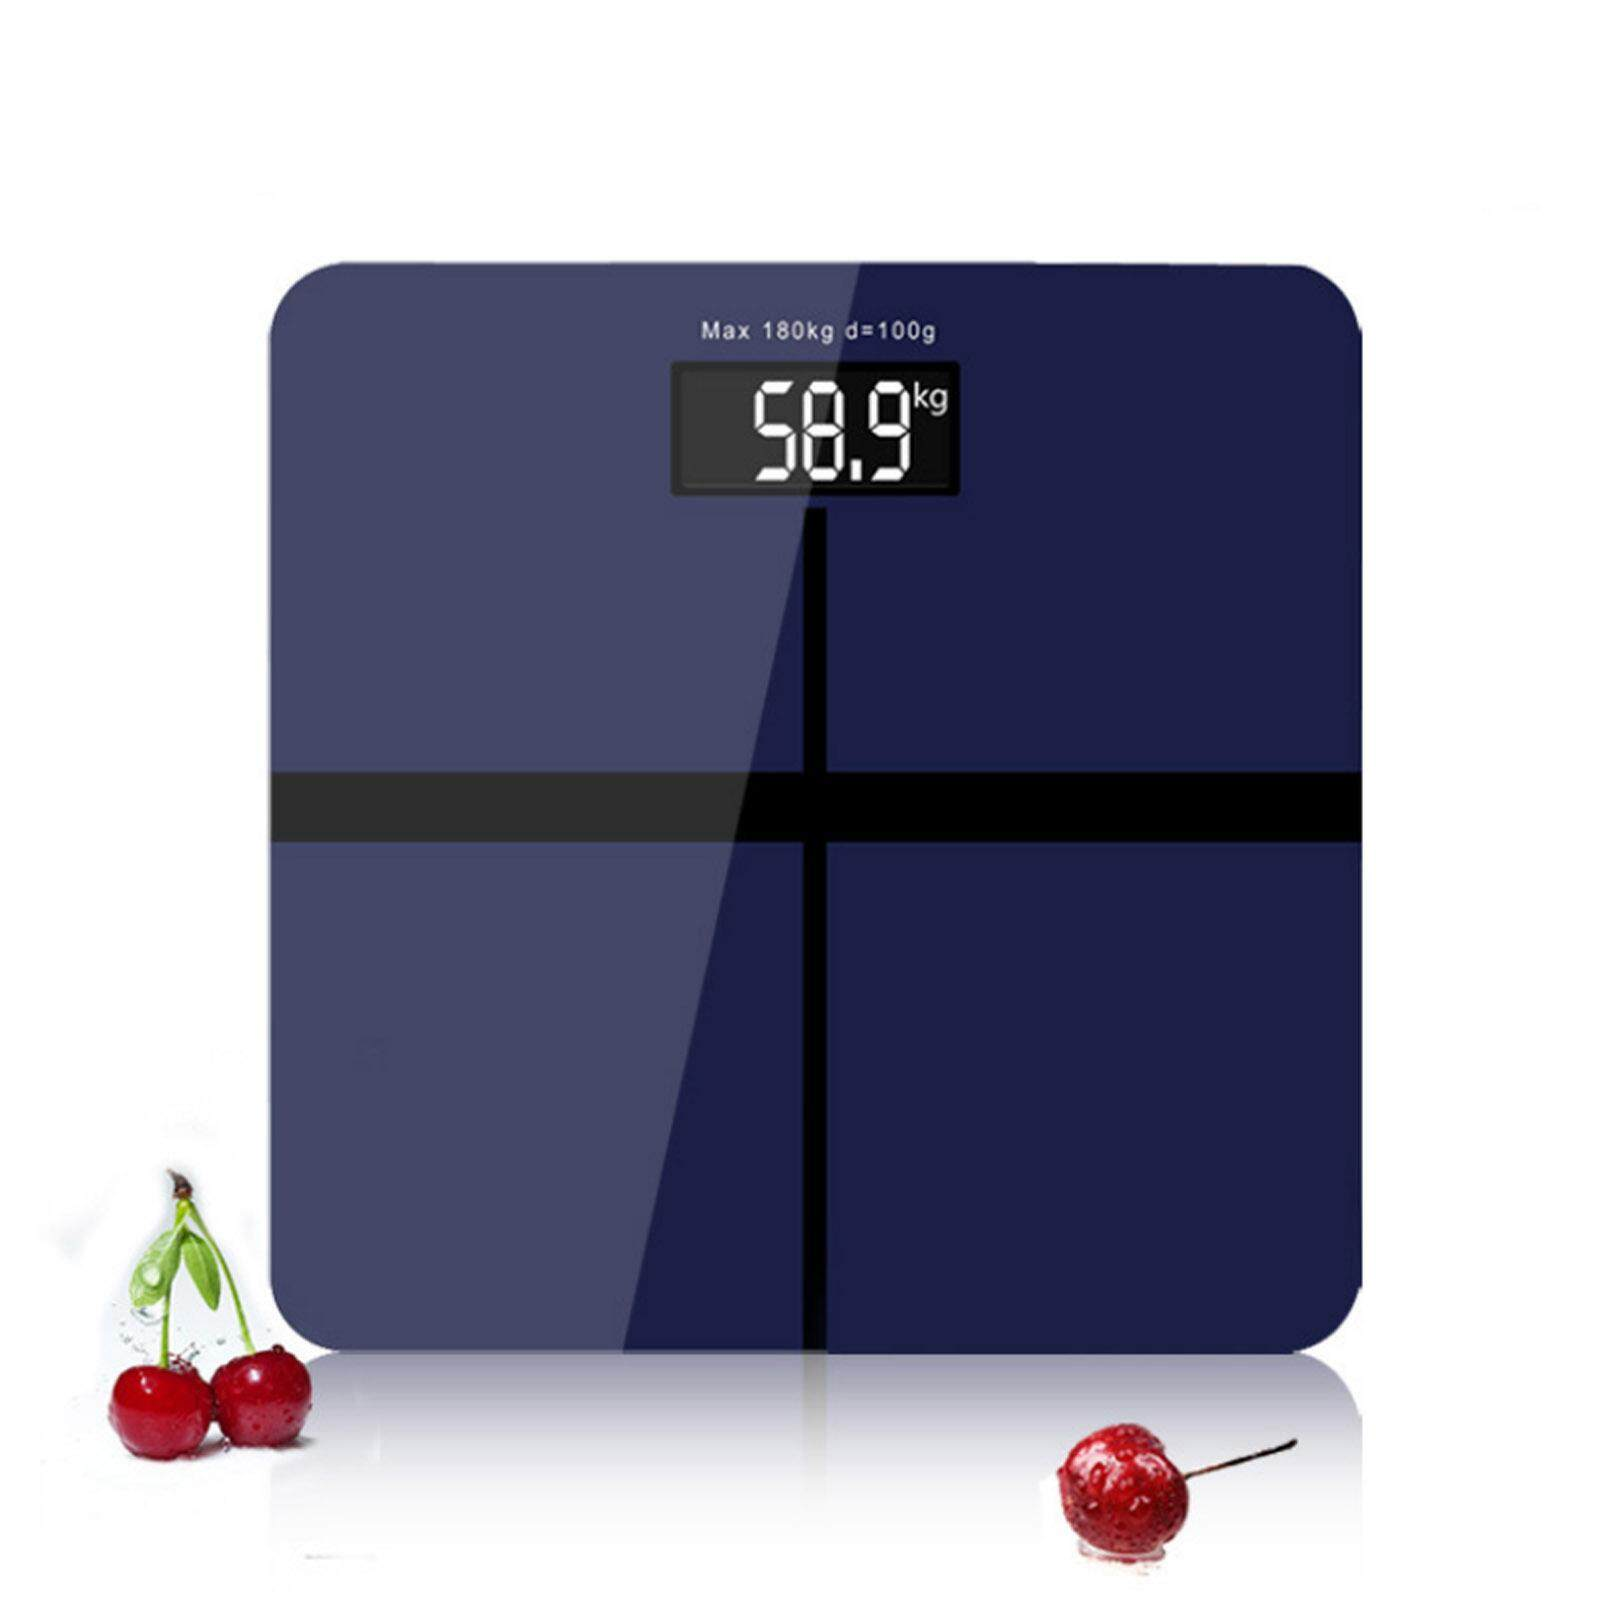 NaVa Precision 28cm*28cm Weight Scale Digital Body Measuring Scale (NAVY BLUE)